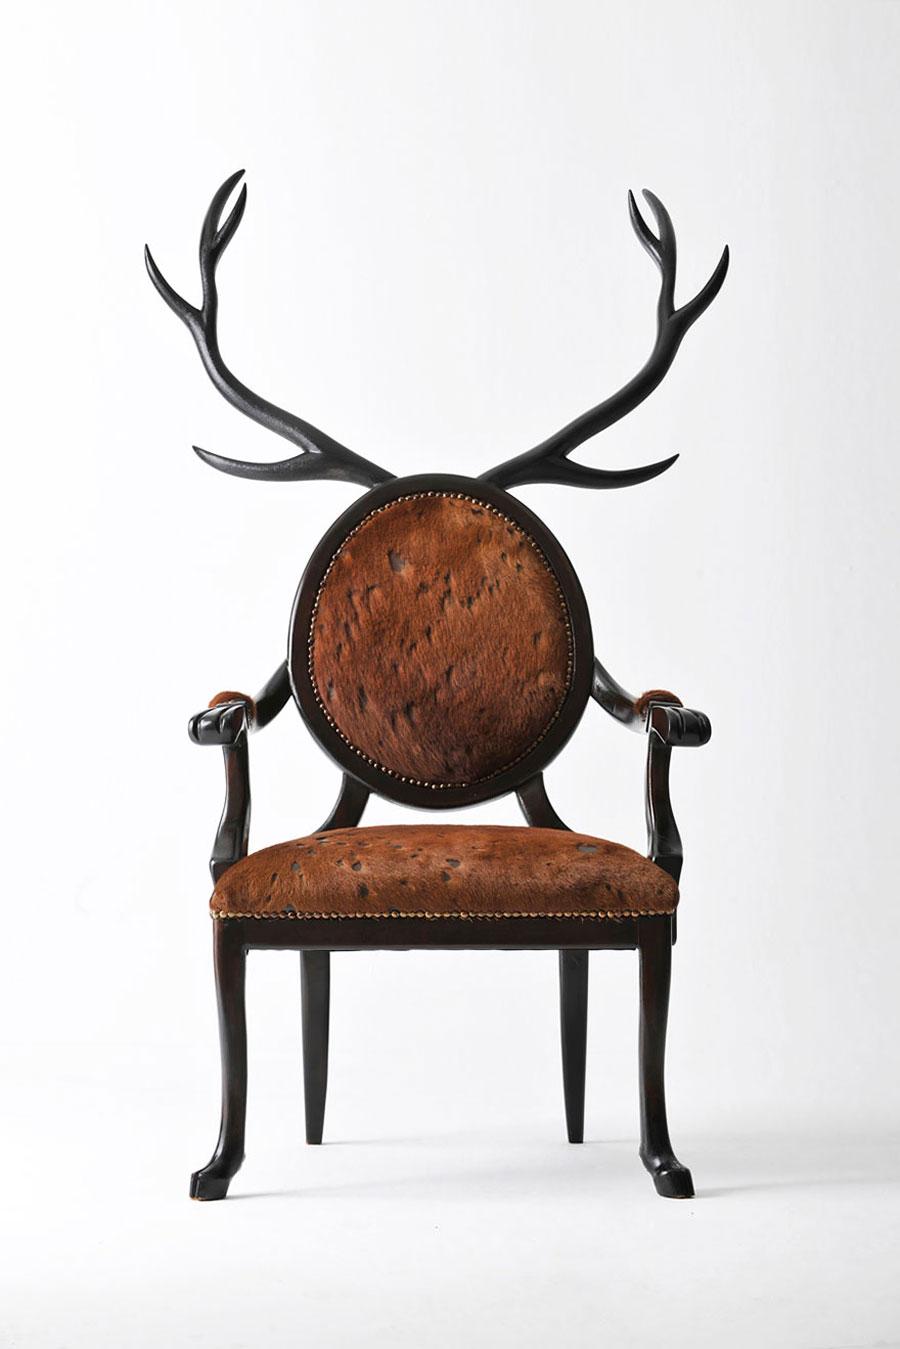 4 strange but visually impressive chair designs